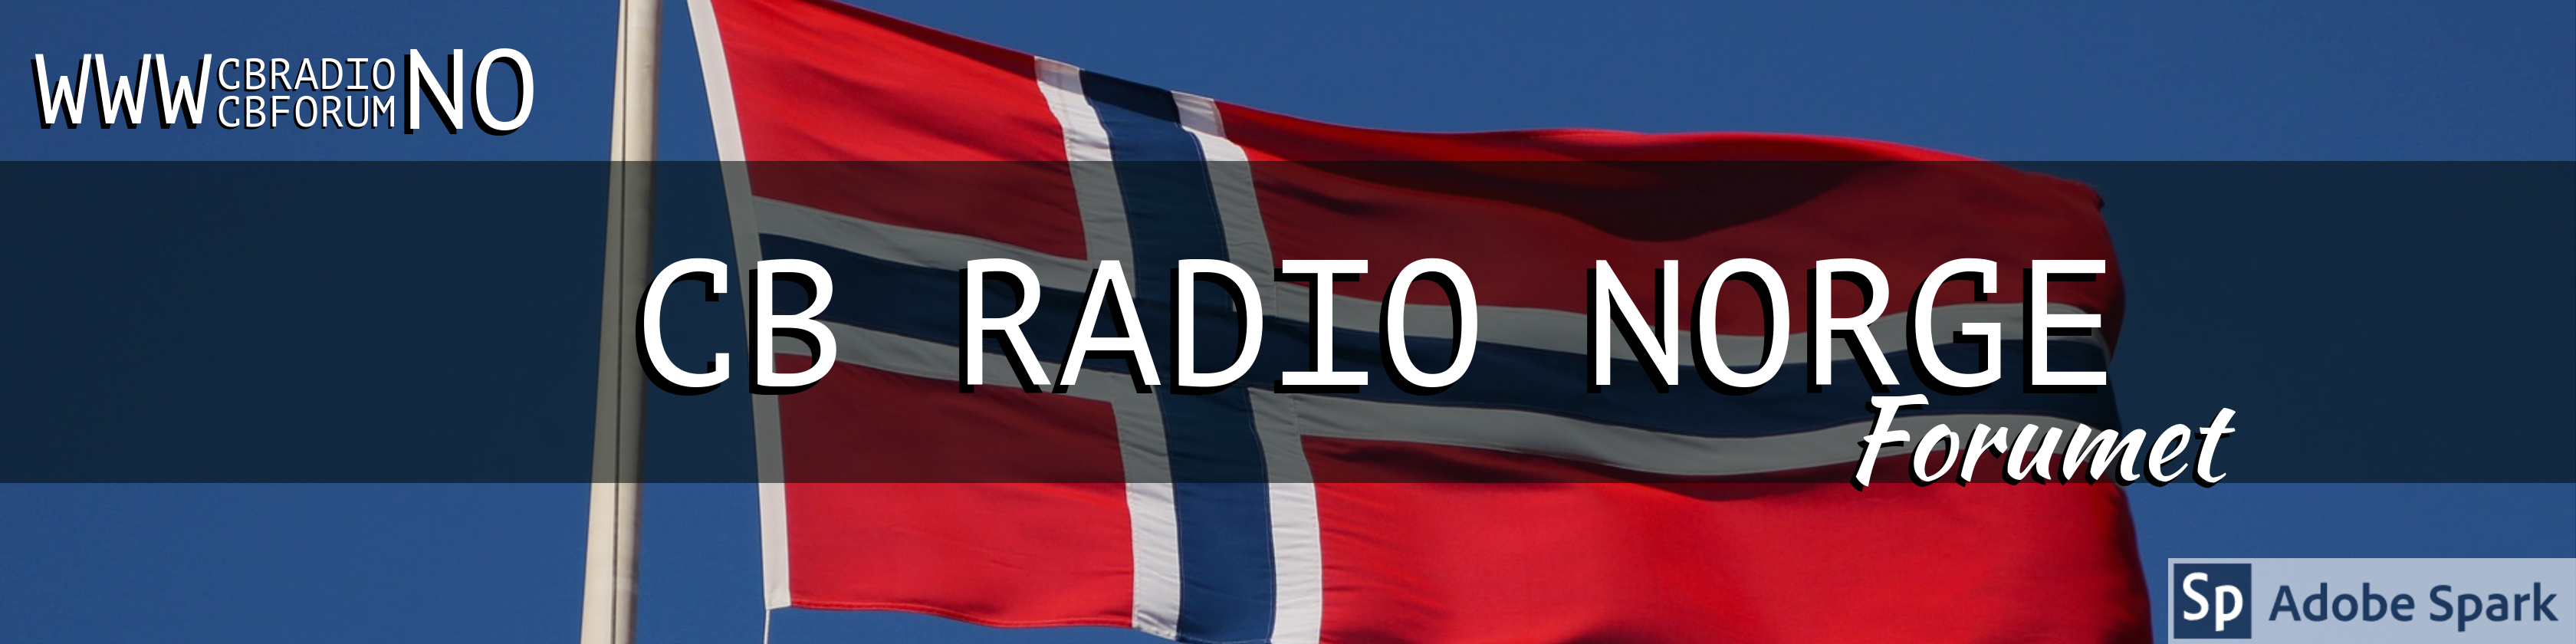 CBForum.no - CB Radio Norge Forumet